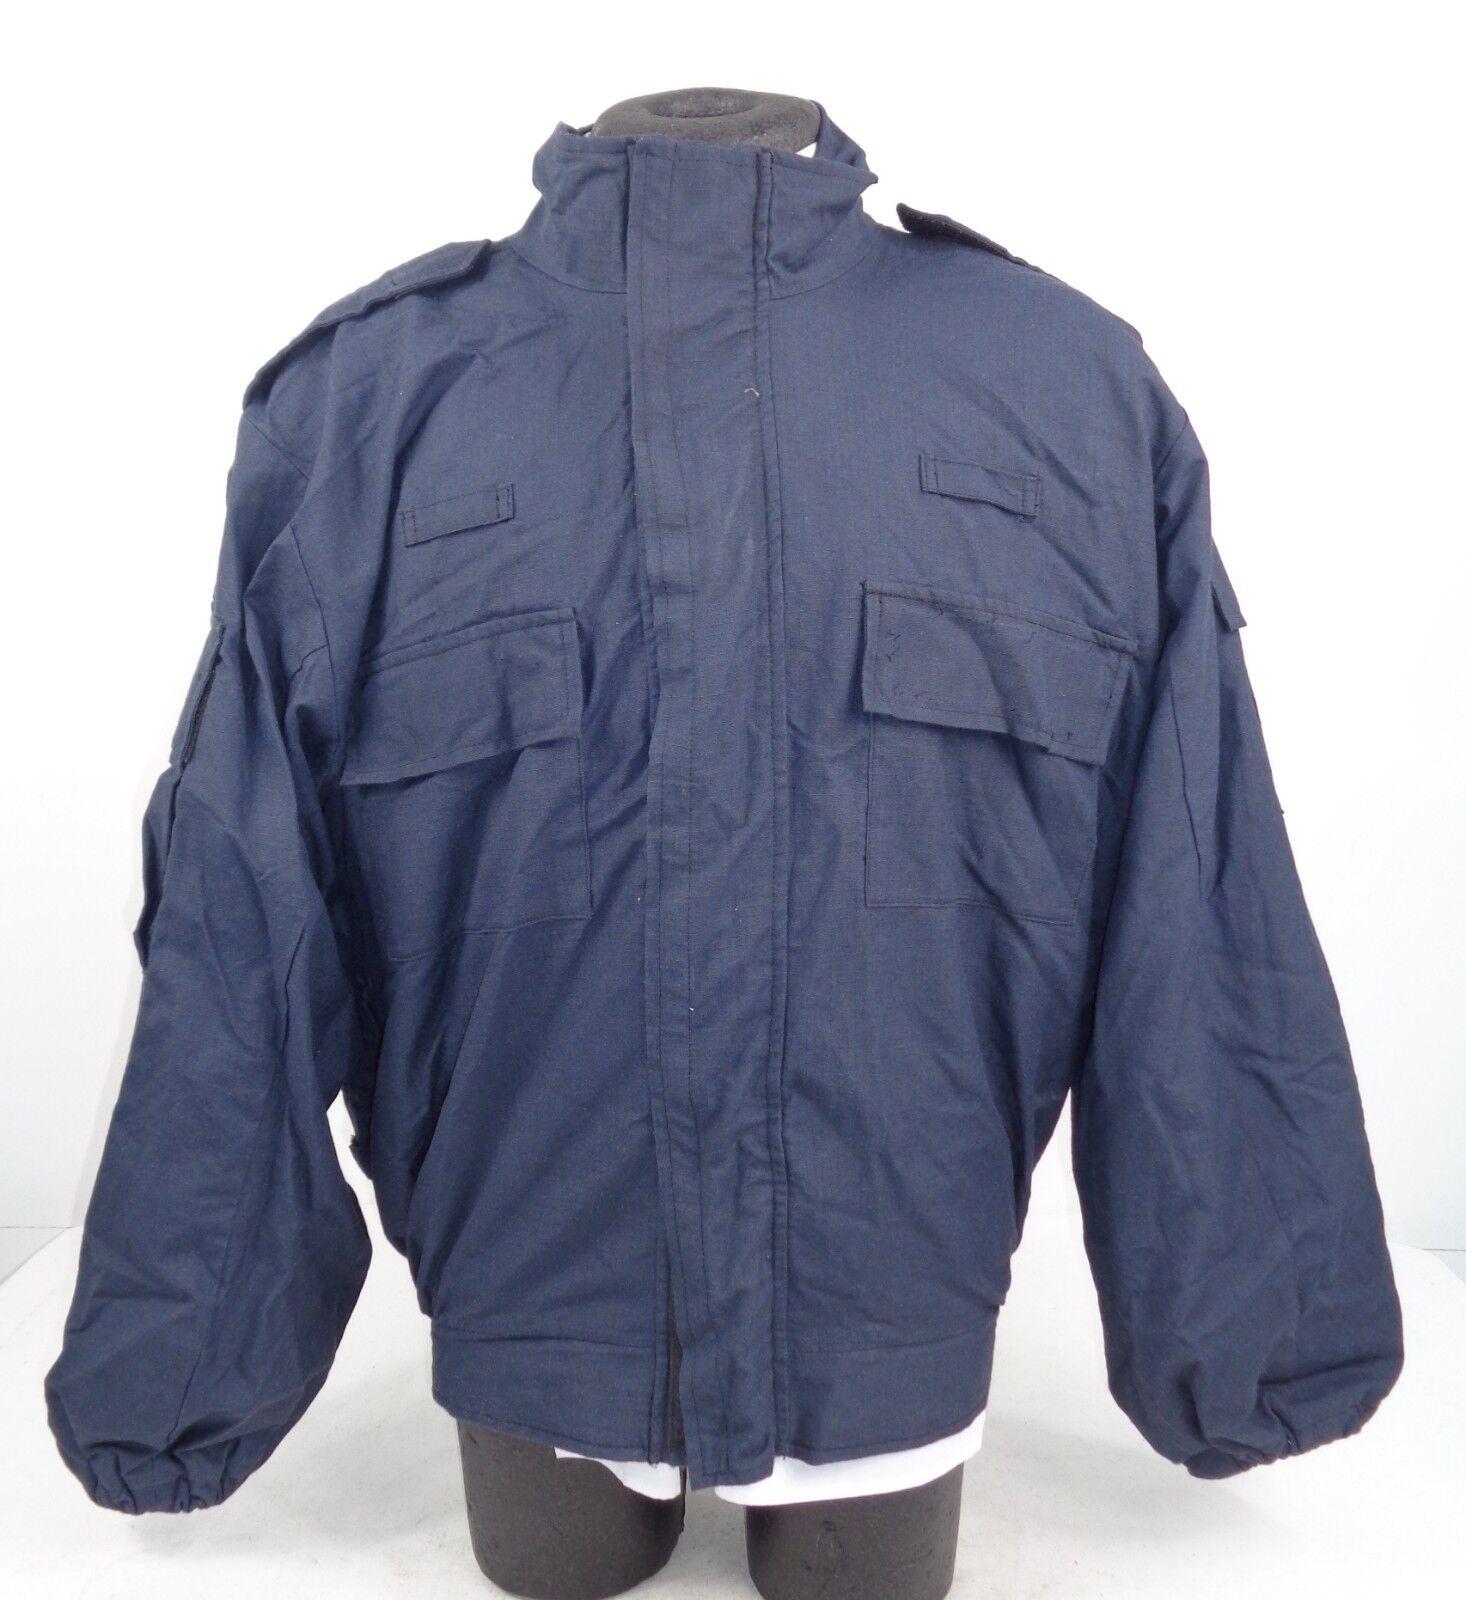 X British Police Windproof GoreTex Lightweight Security Uniform Patrol Fleece G1